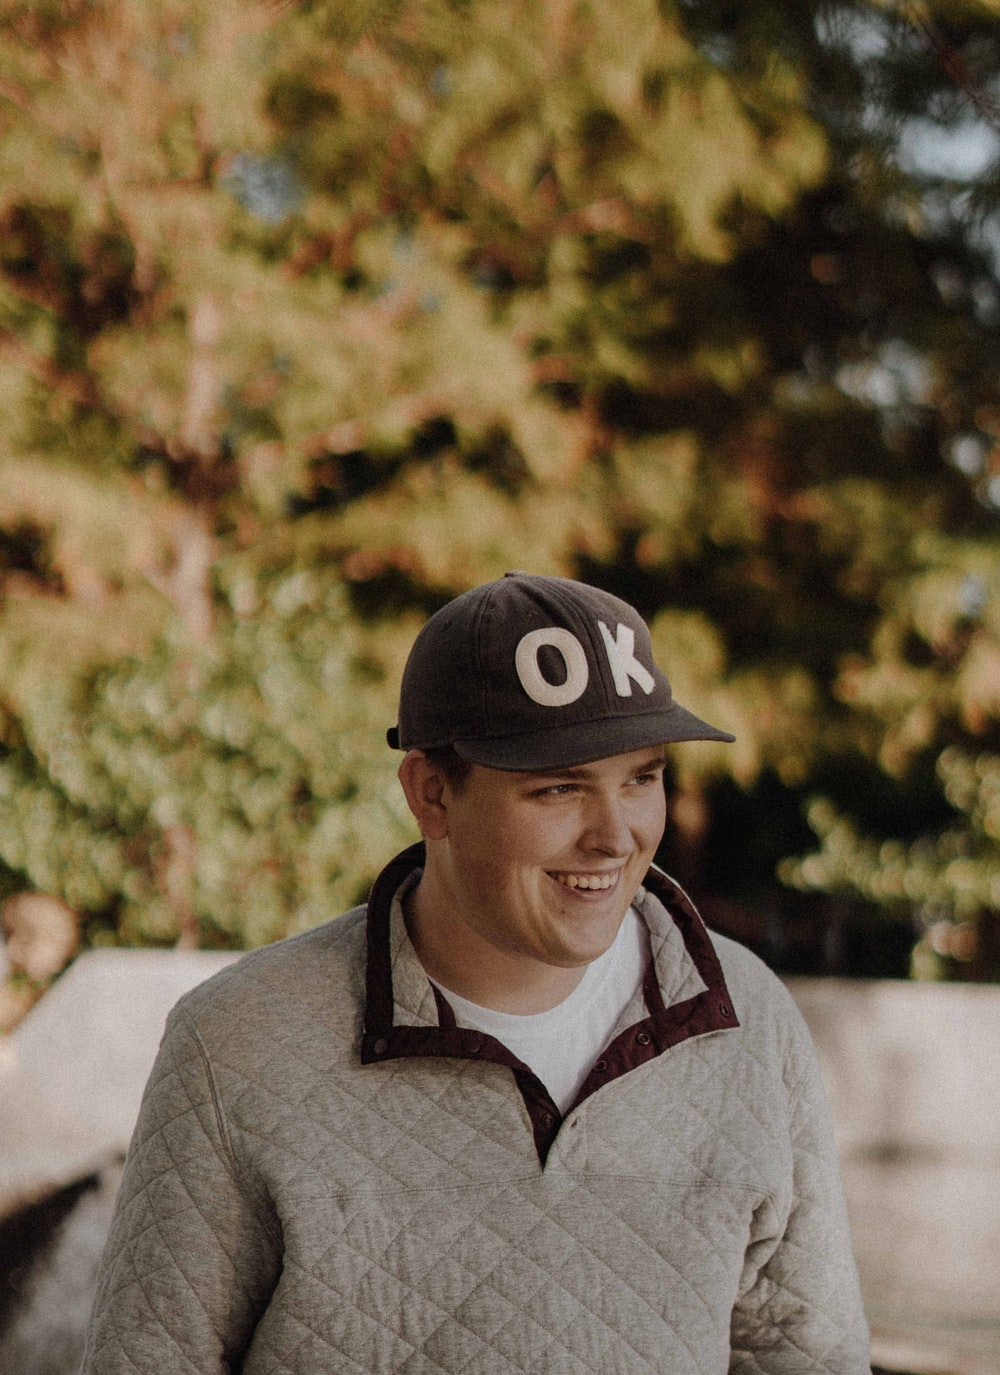 man in Ok cap and gilet